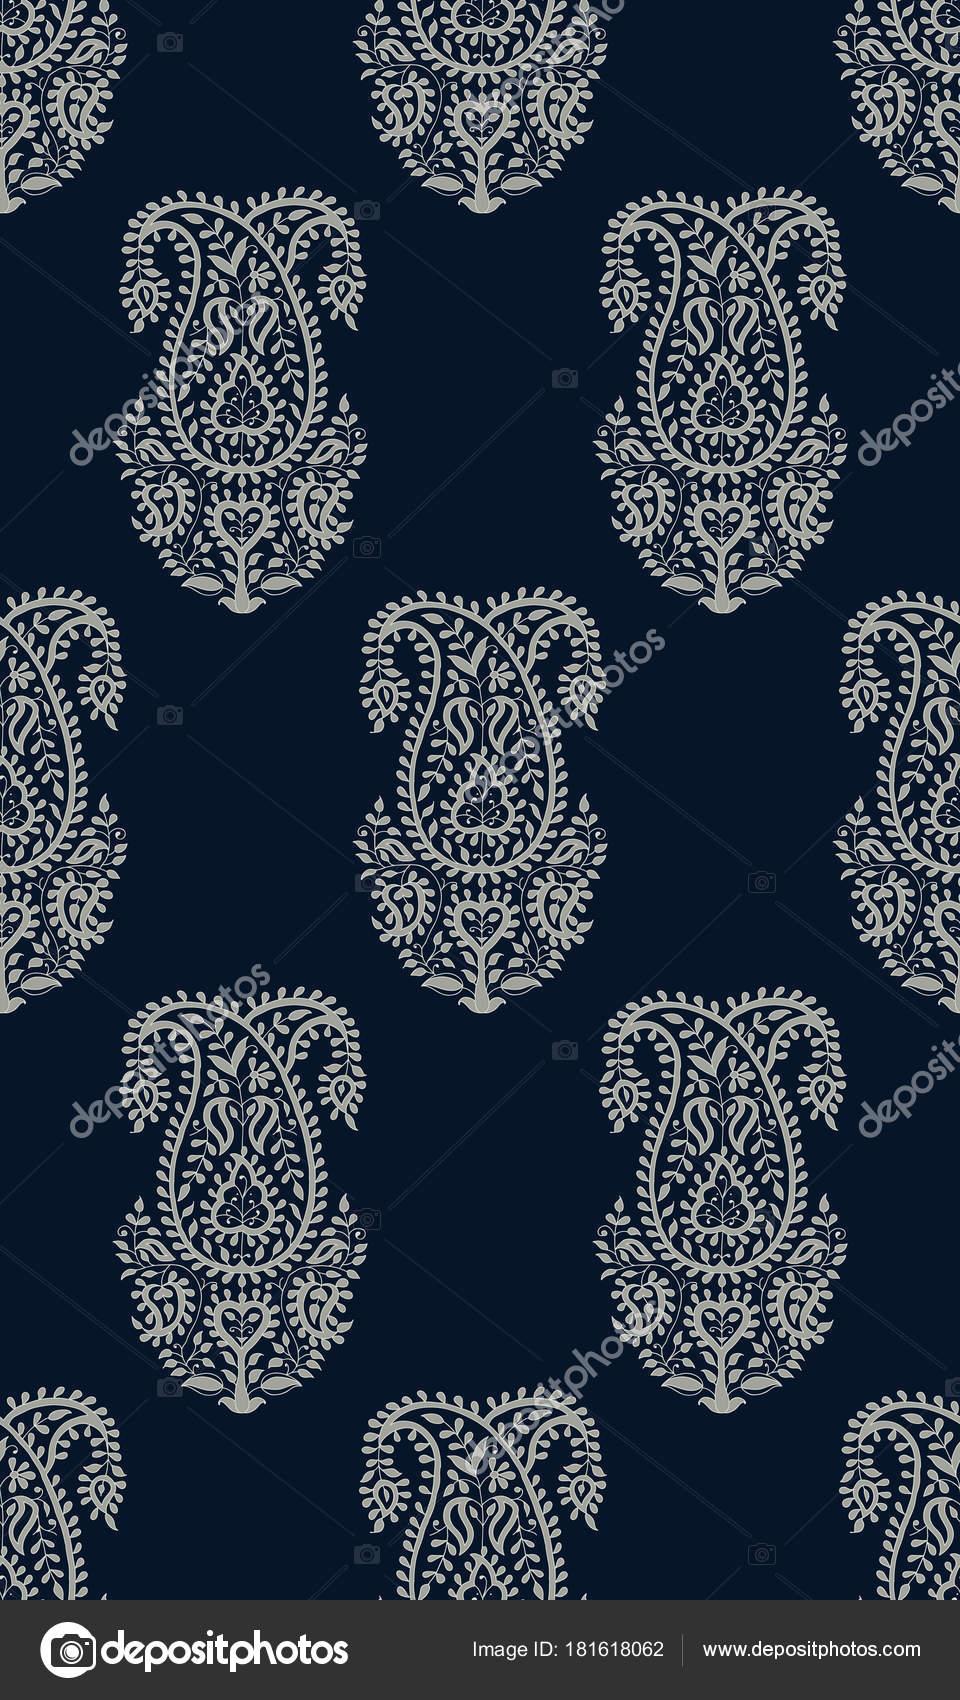 Seamless Indigo Dye Woodblock Printed Paisley Pattern Traditional